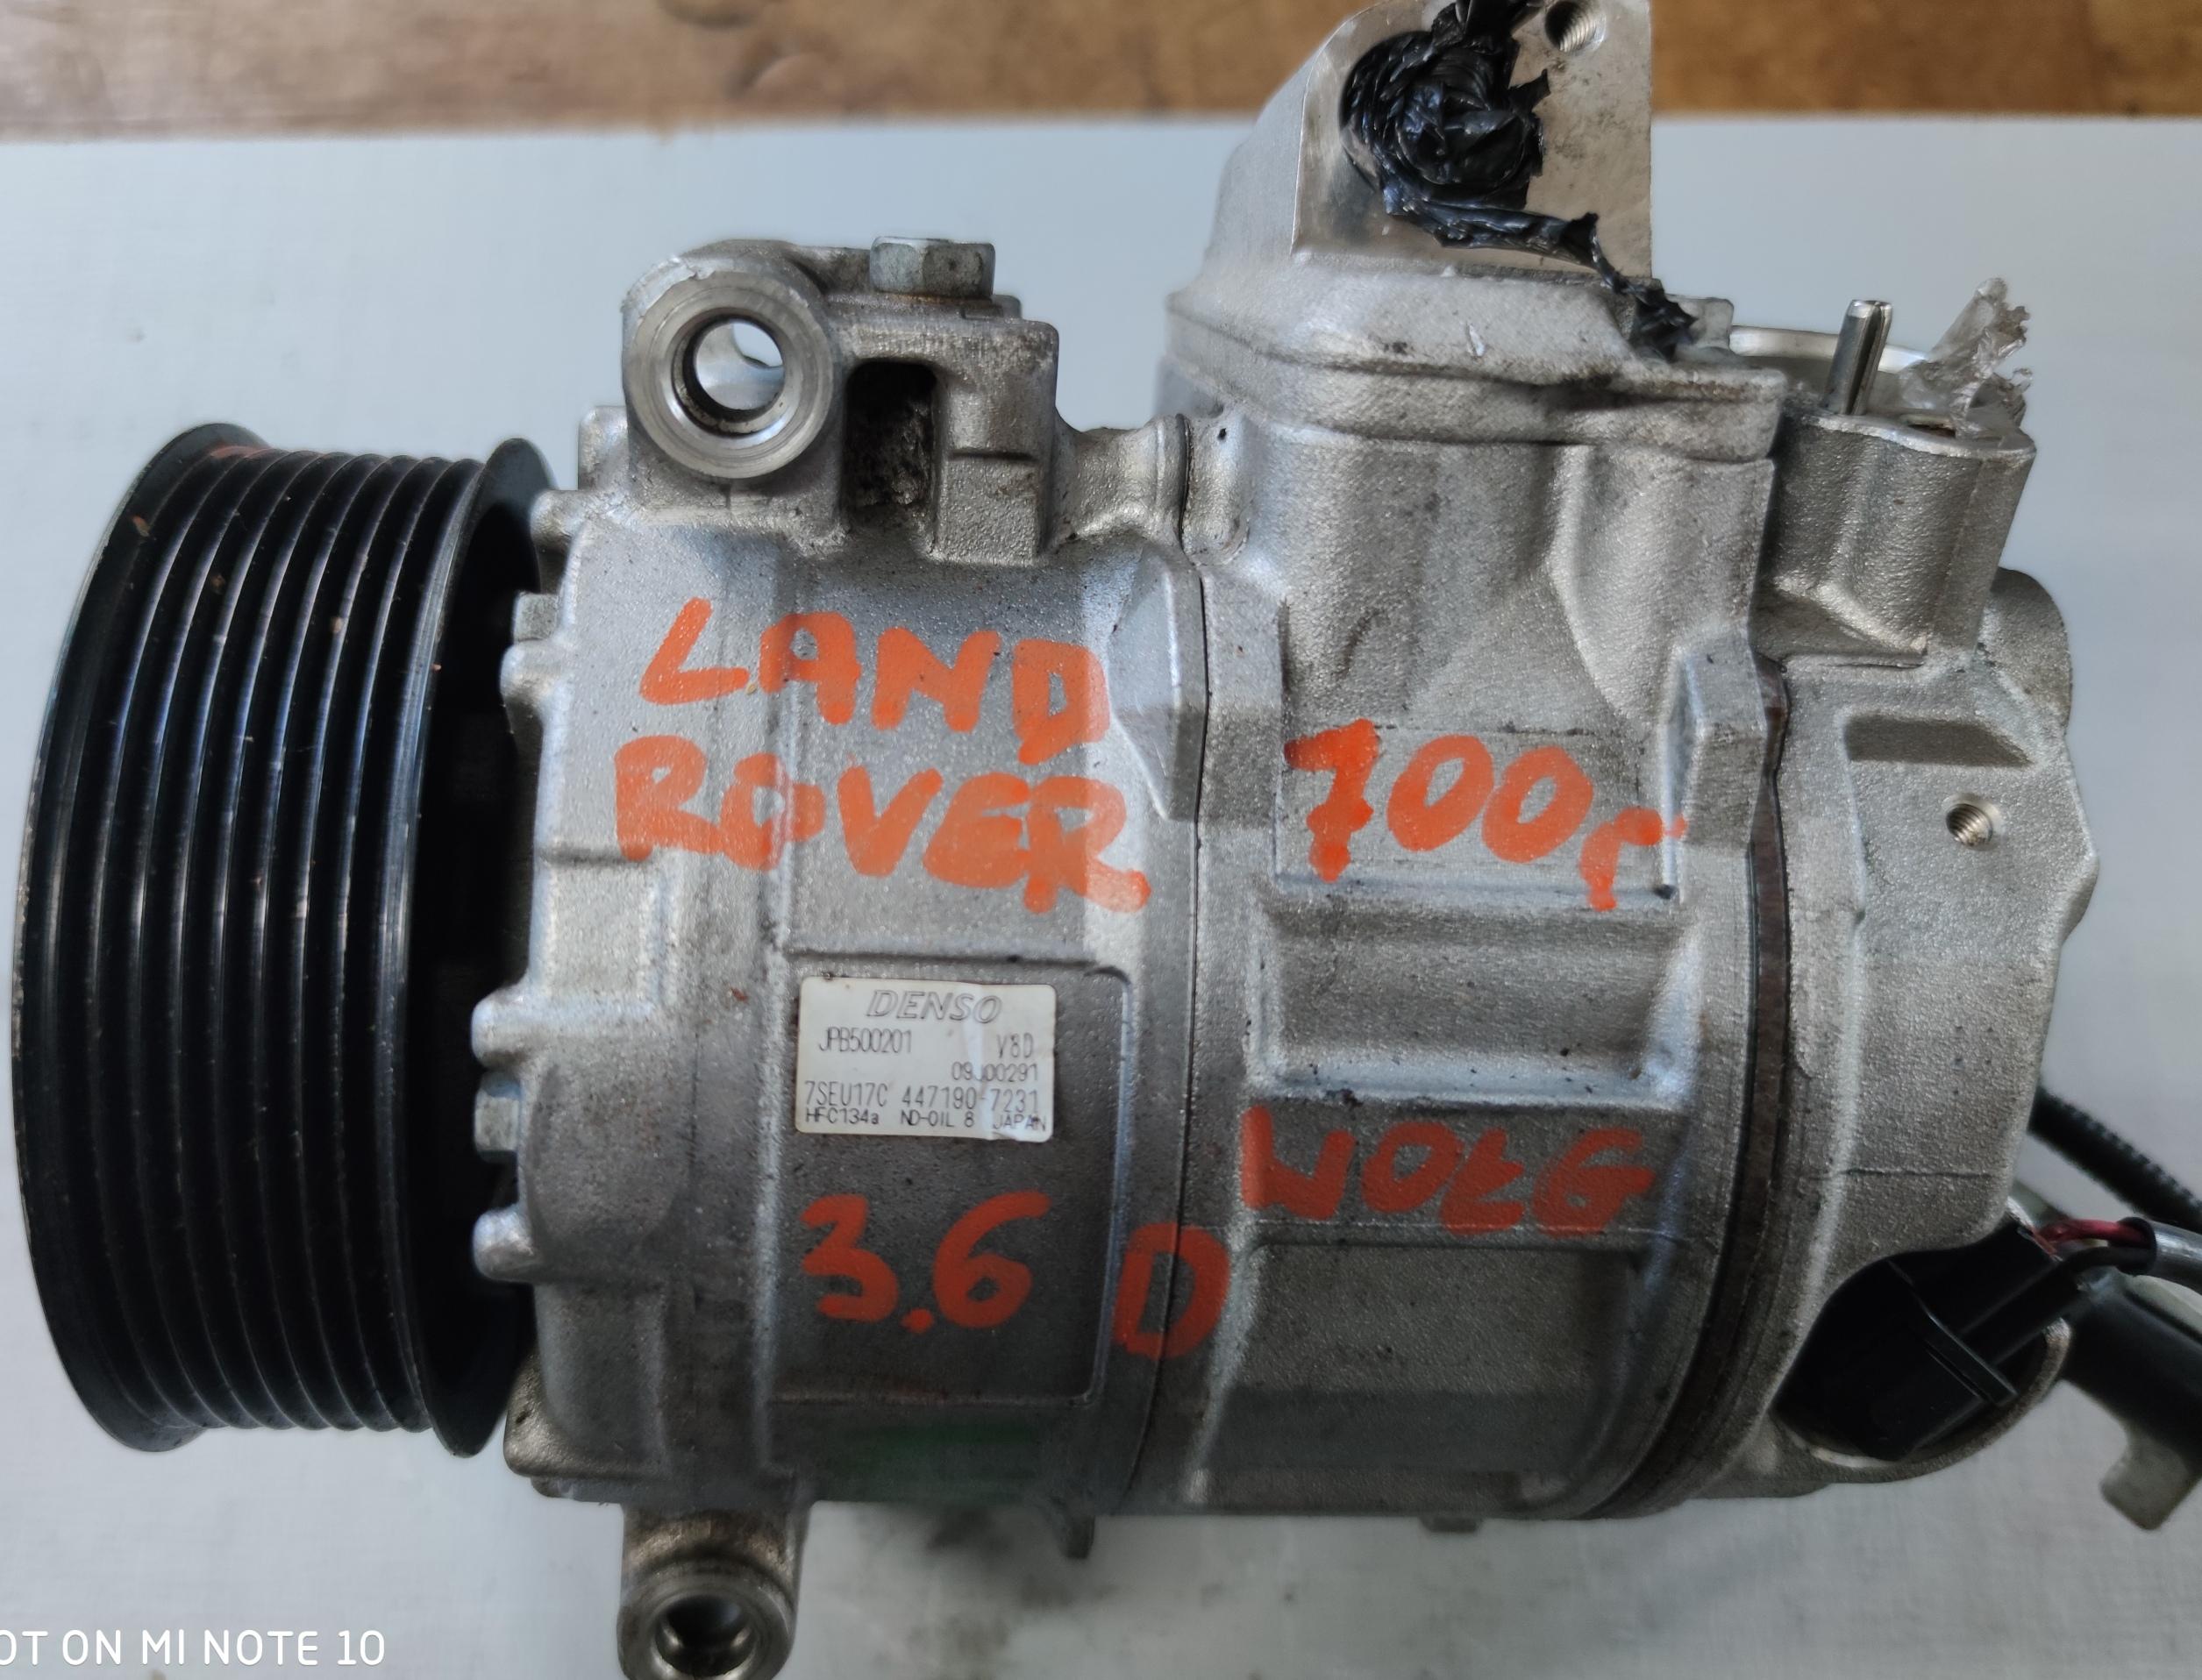 Sprężarka Klimatyzacji Land Rover 3.6 D 447190-7231